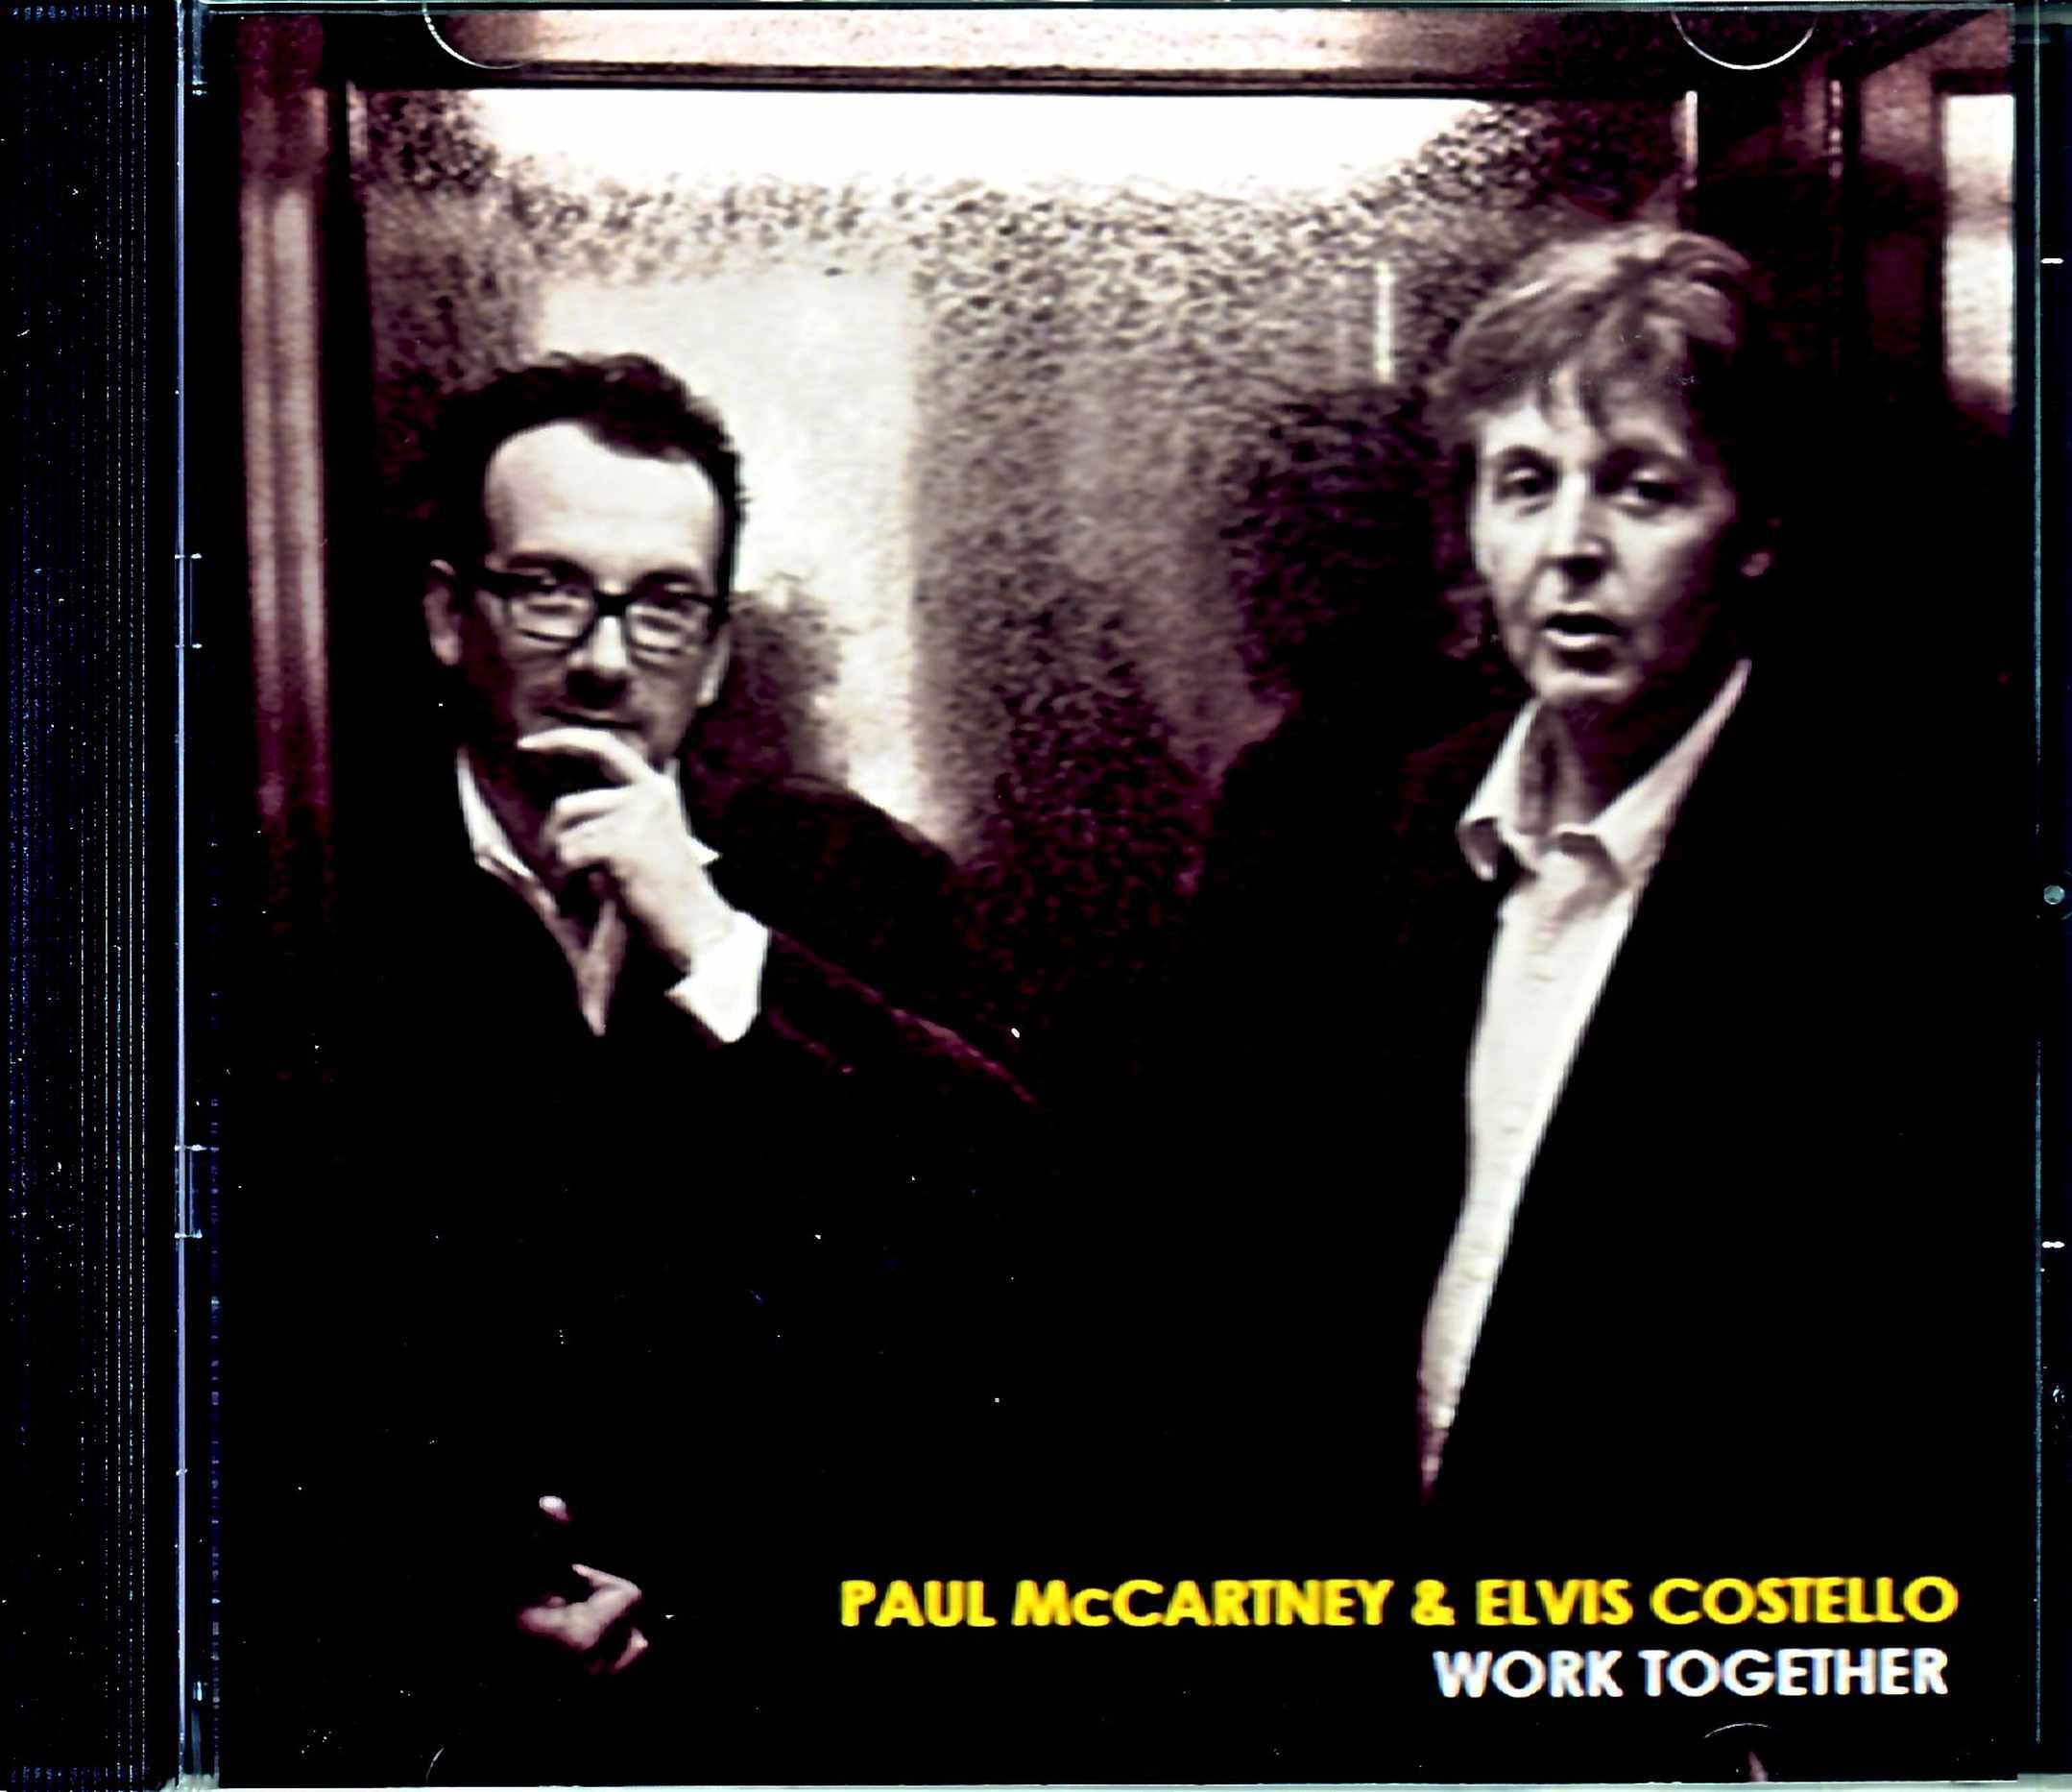 Paul McCartney,Elvis Costello ポール・マッカートニー エルヴィス・コルテロ/Officially Released Demo Tracks